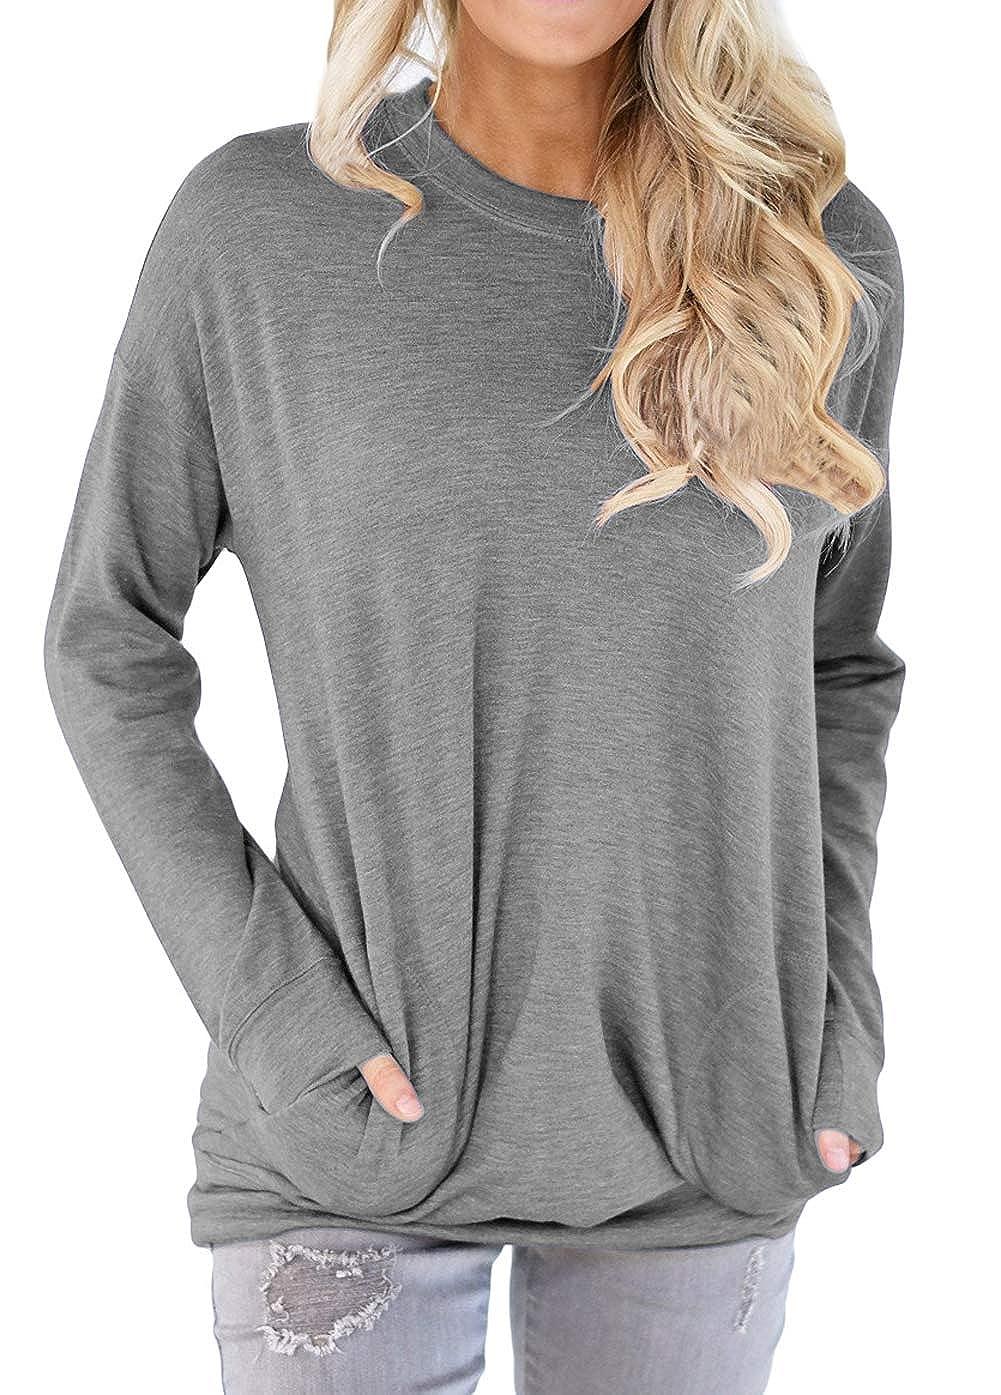 Shawhuwa Womens Casual Long Sleeve Tunic Tops Loose Blouse T Shirt